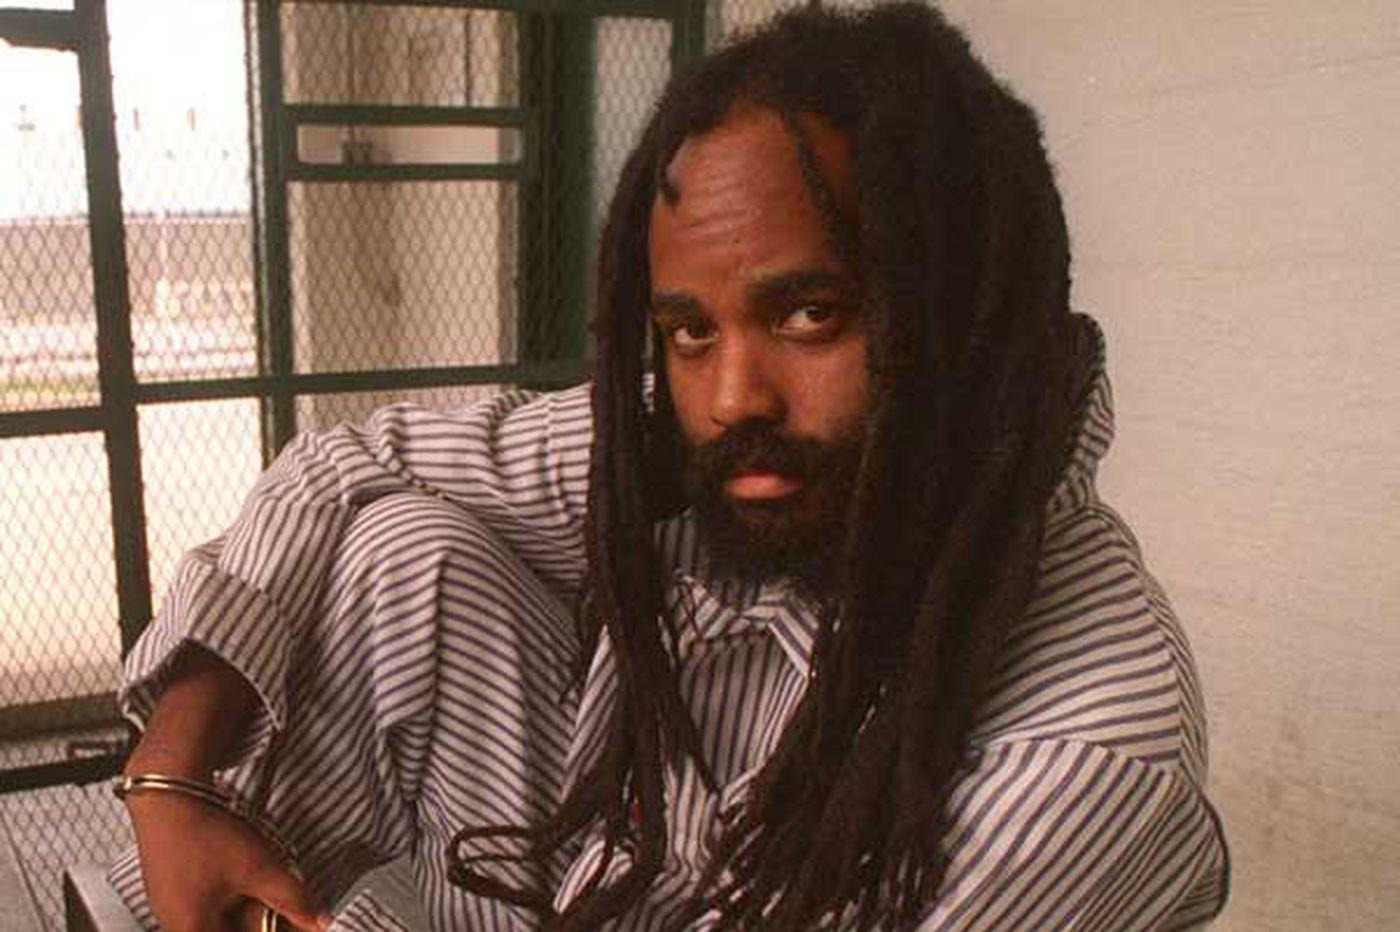 Mumia Abu-Jamal ailing, supporters say